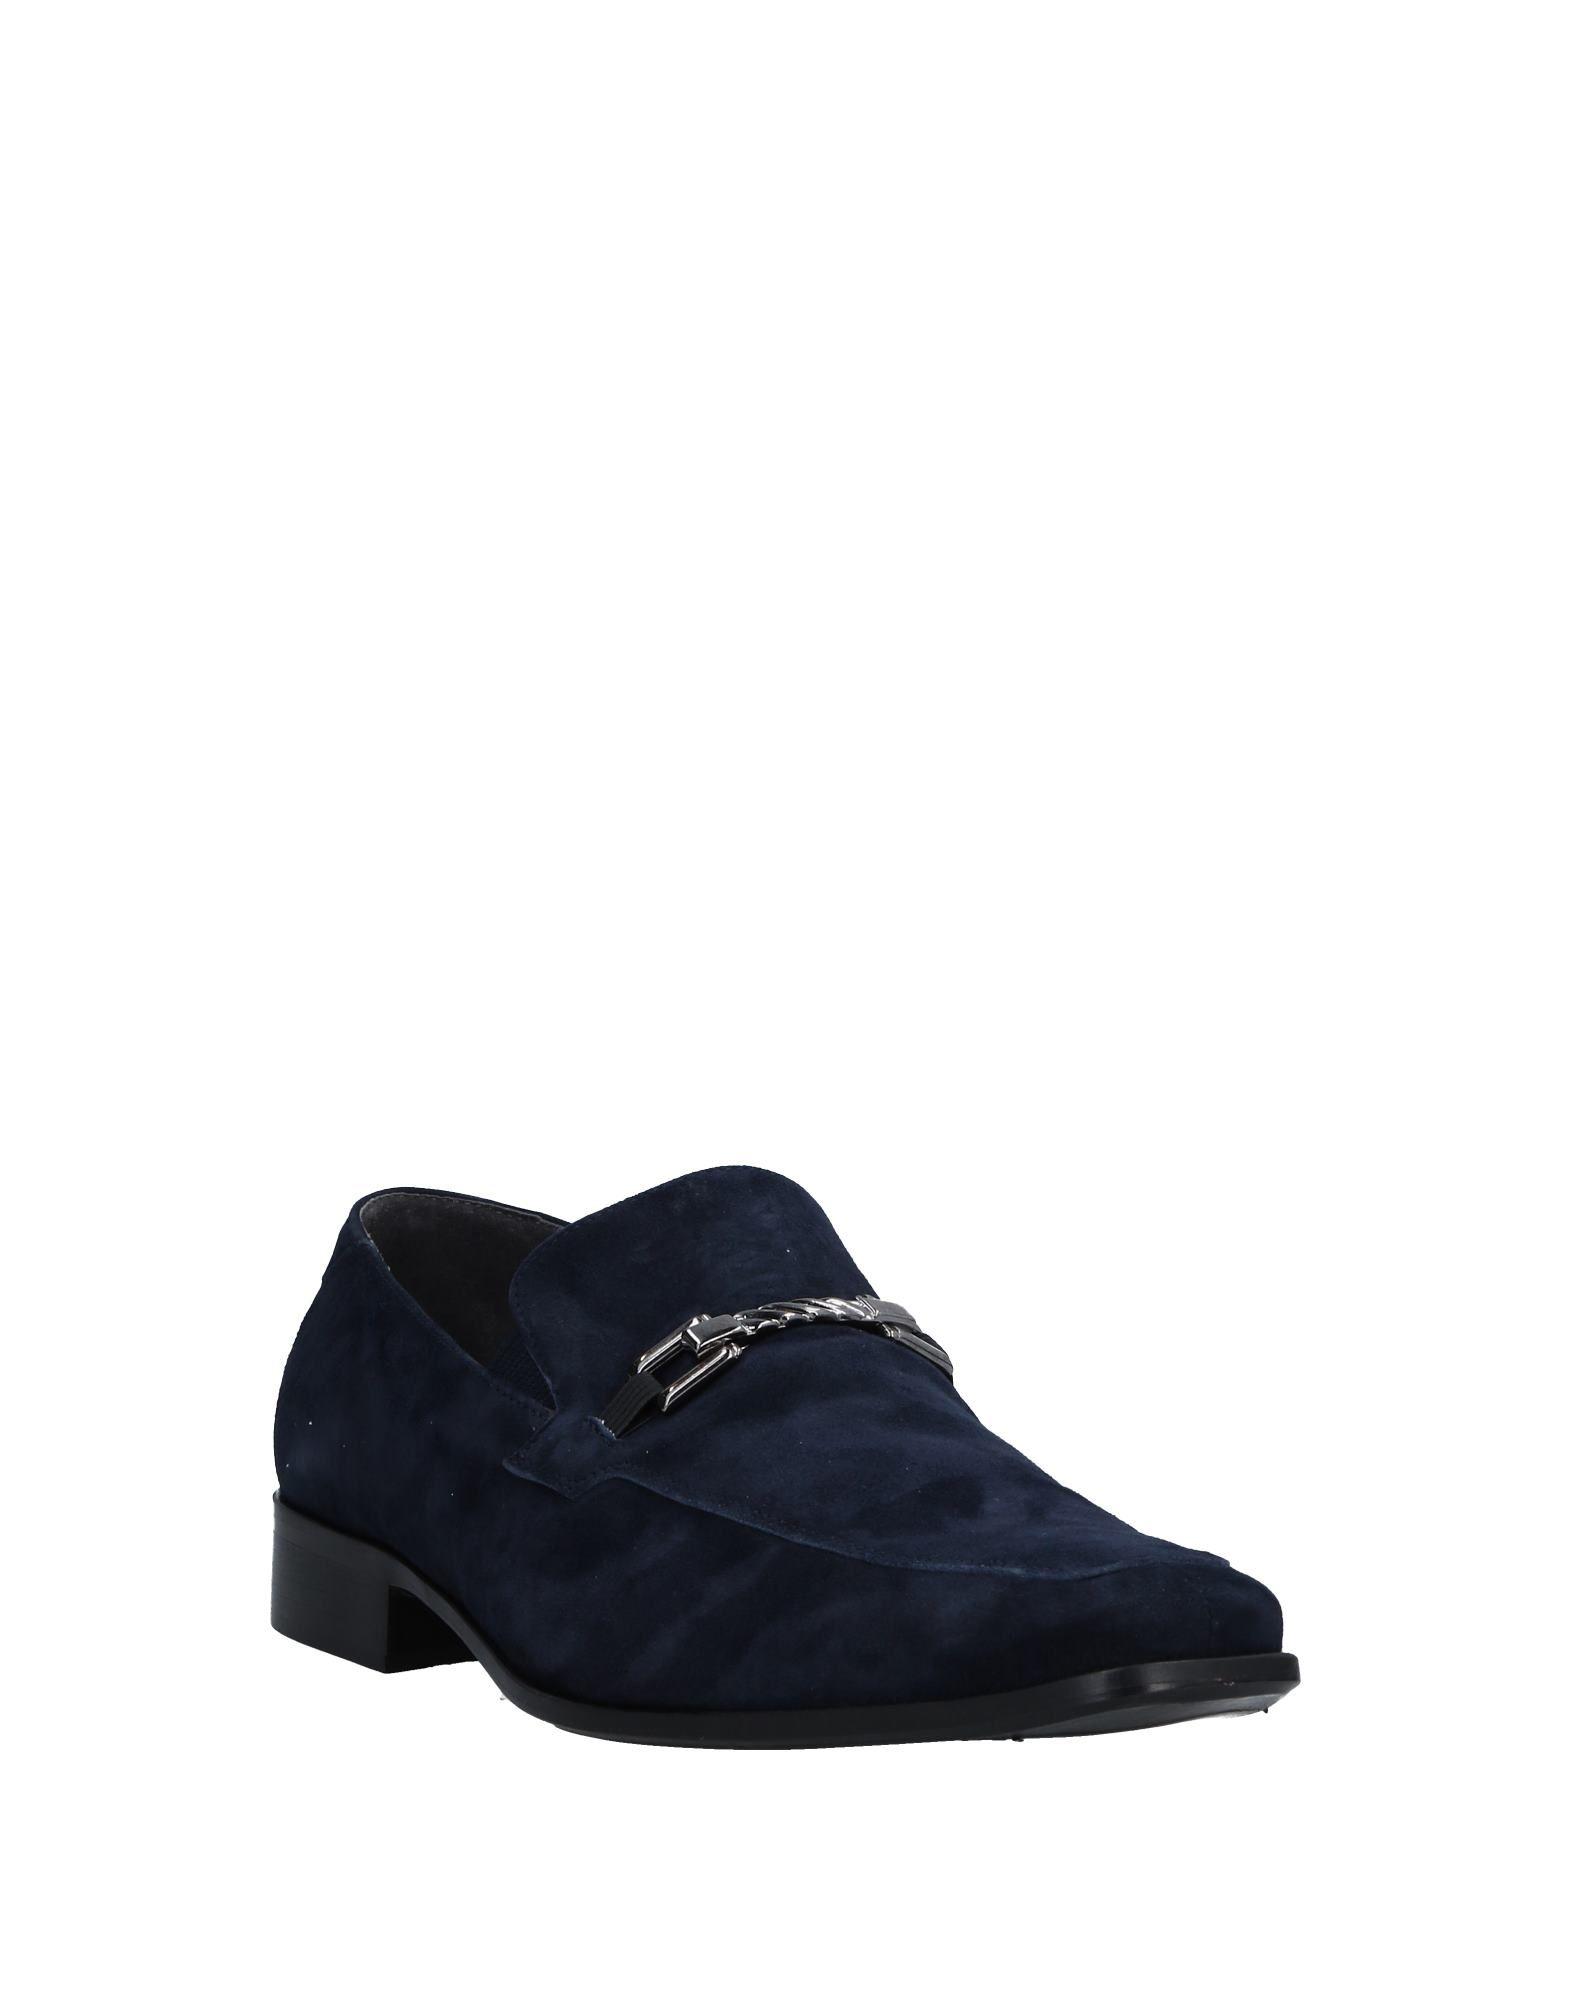 ... Rabatt Mokassins echte Schuhe Antonio Crisci Mokassins Rabatt Herren  11534911RT 239eb5 ... 0adca7dc8f